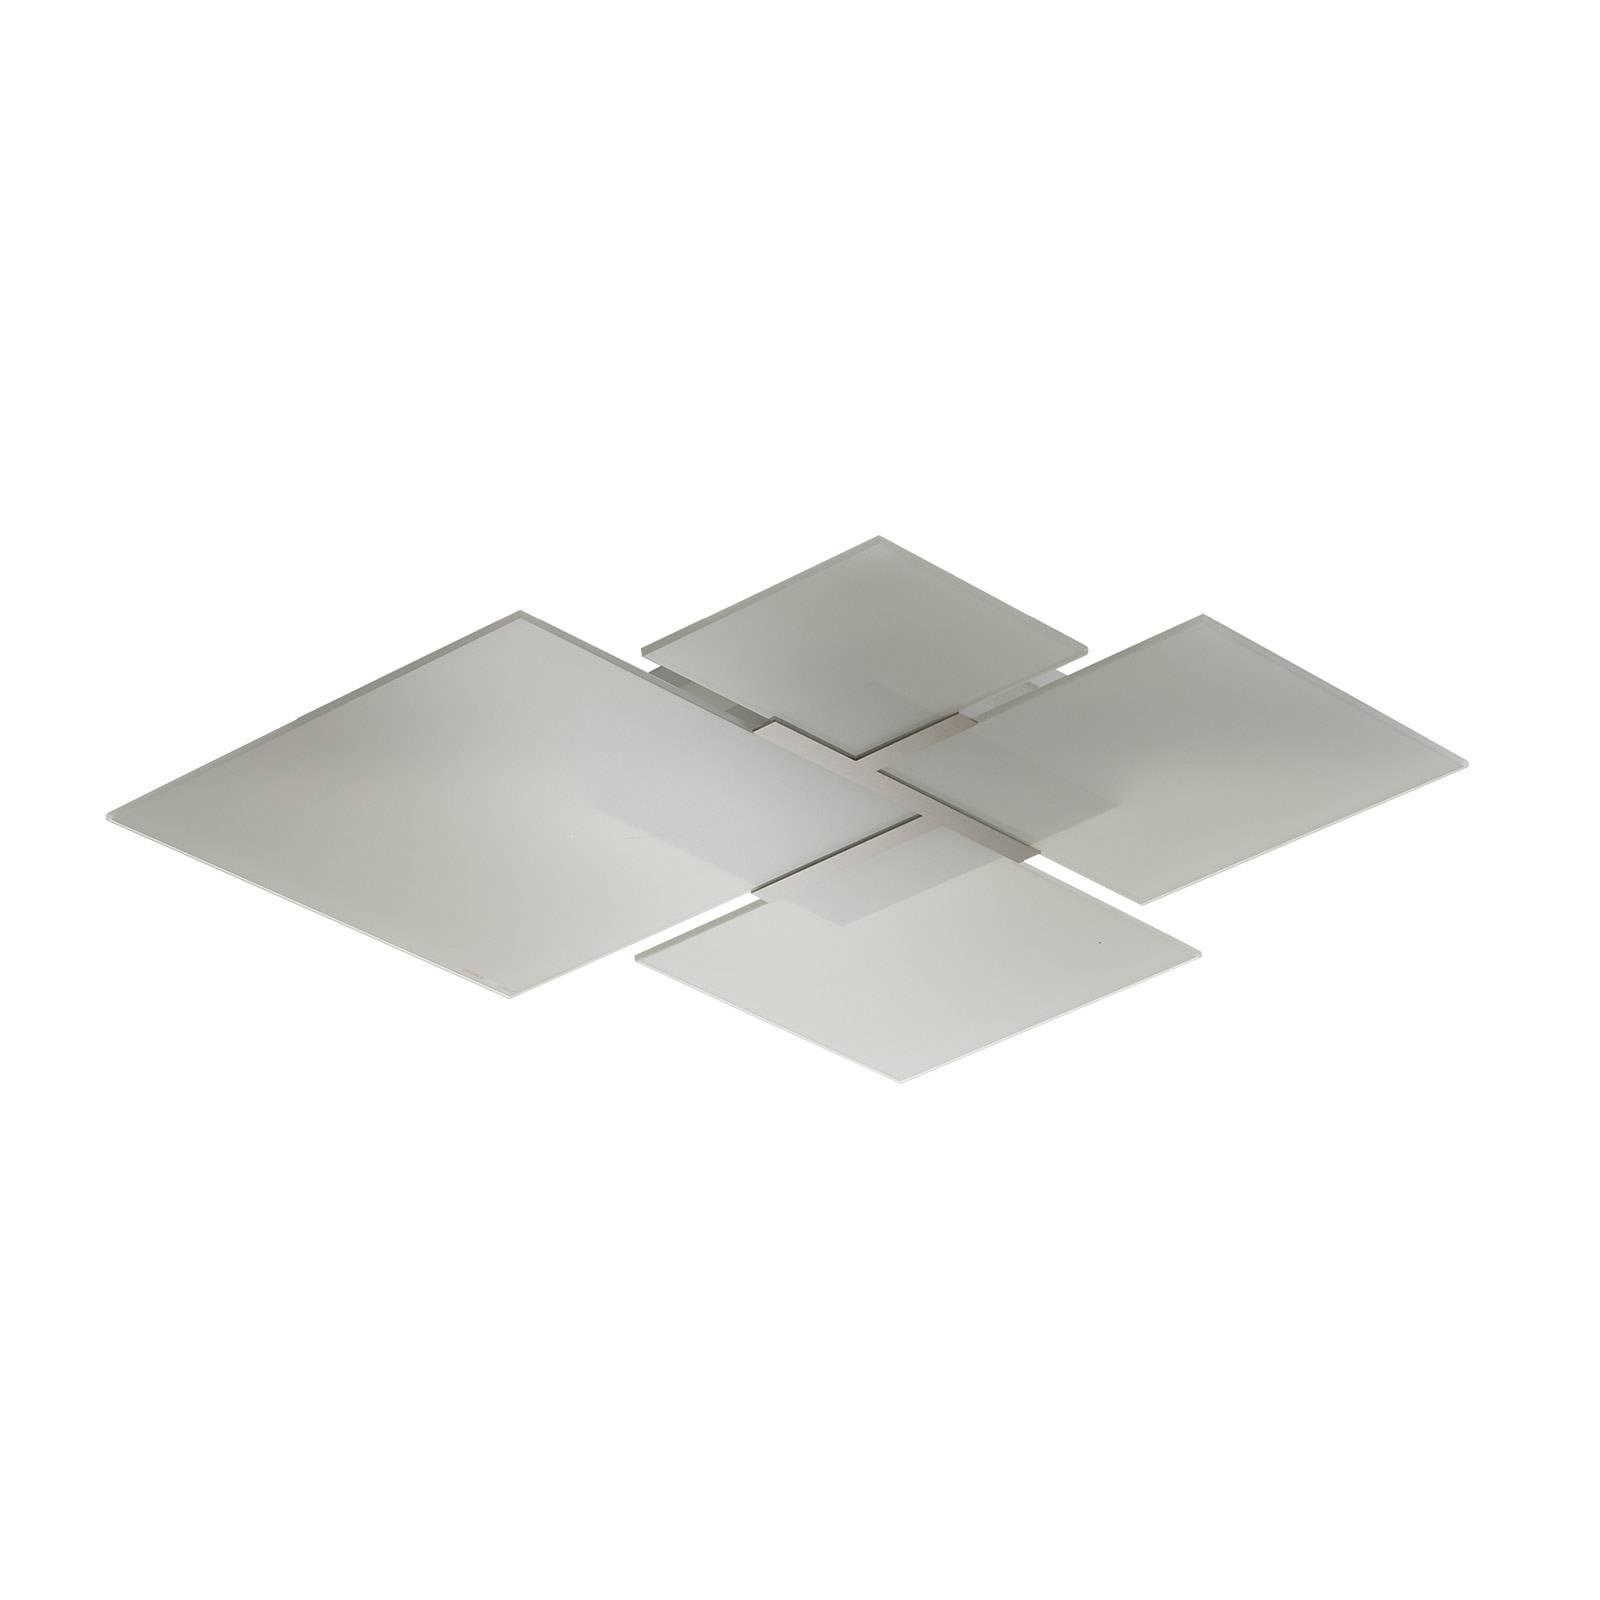 Kattovalaisin Quadrifoglio 8050, teräs, 61 cm